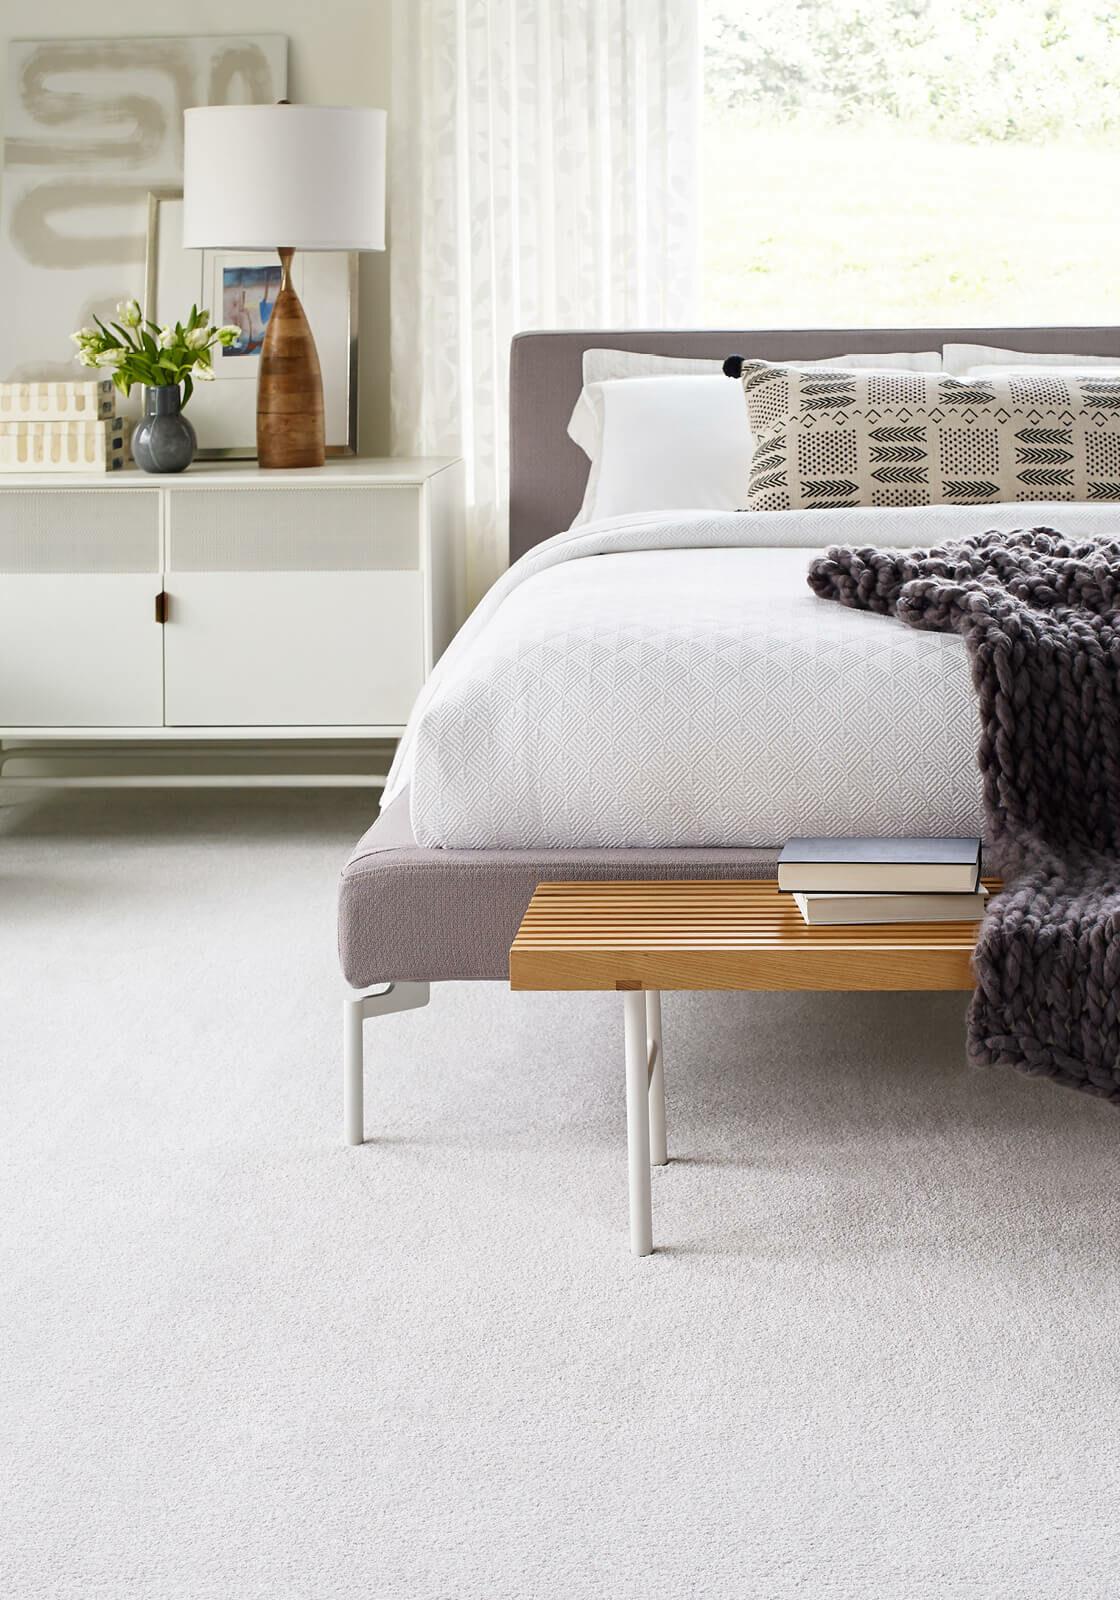 Find Your Comfort Carpet | Dolphin Carpet & Tile